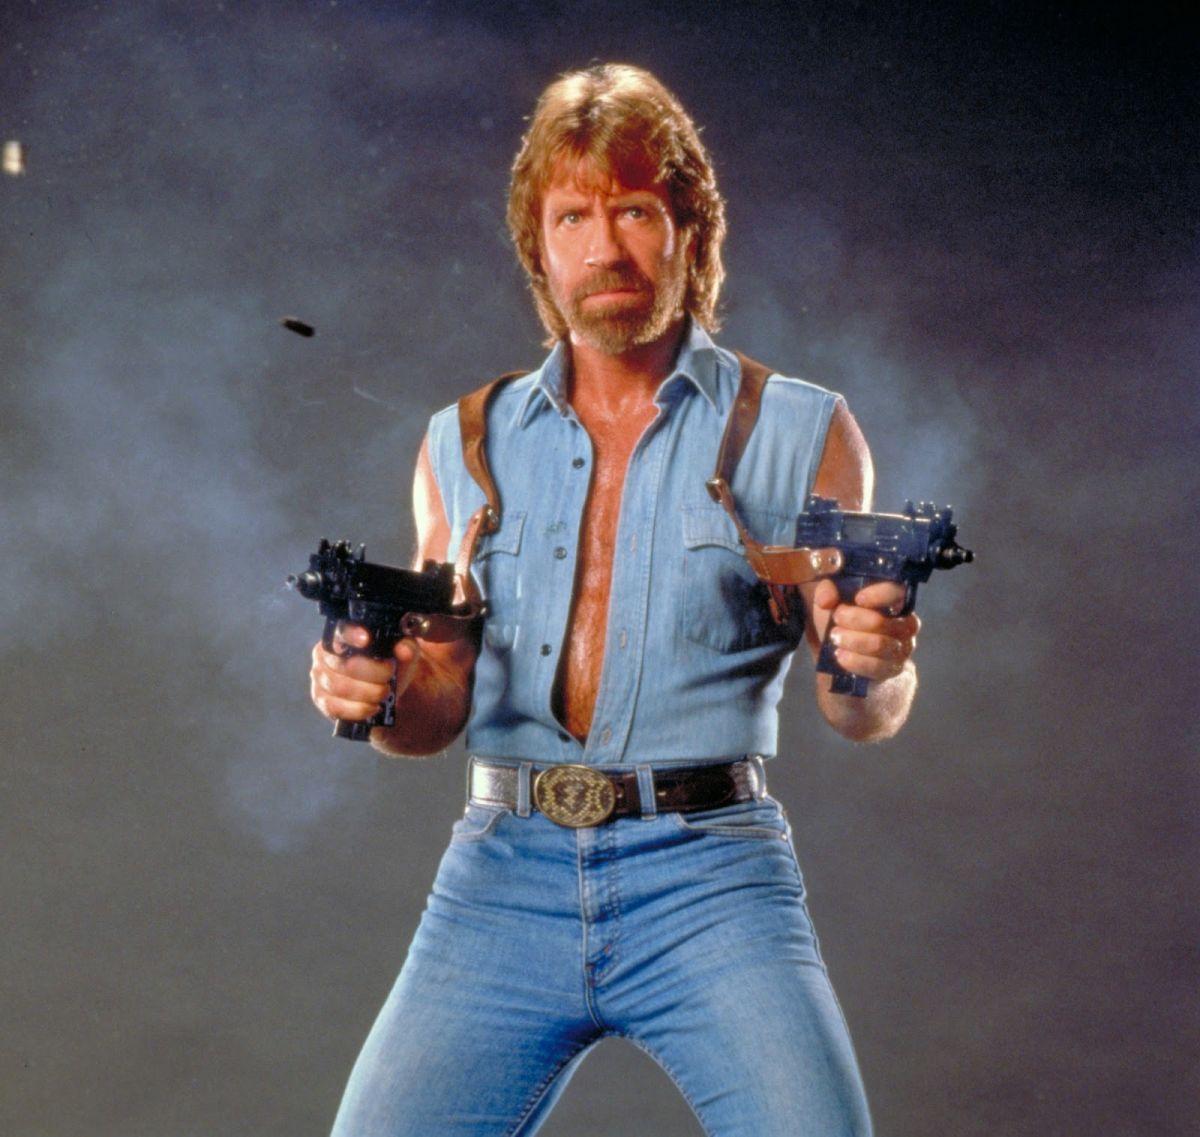 Chuck Norris Guns chuck norris guns meme generator imgflip,Meme Generator Two Images